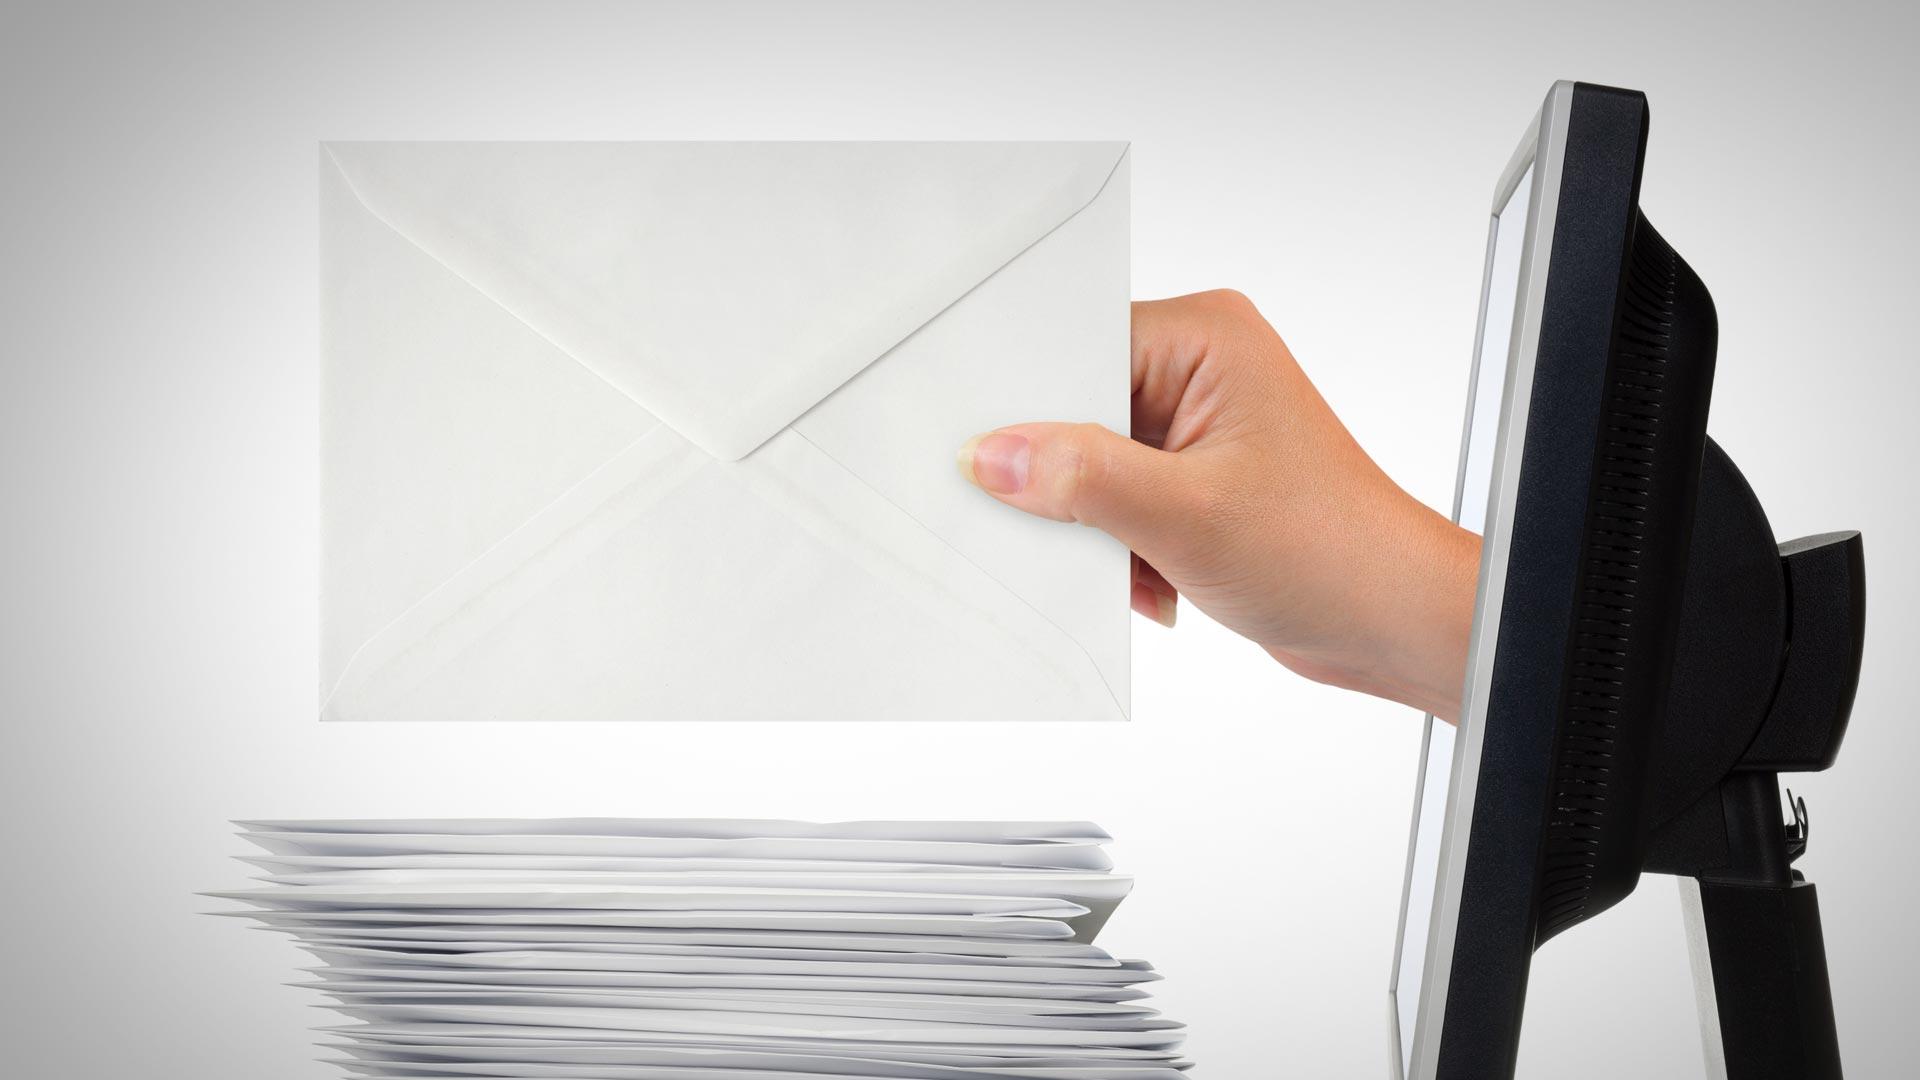 Email: ¿Llegará mi mensaje?